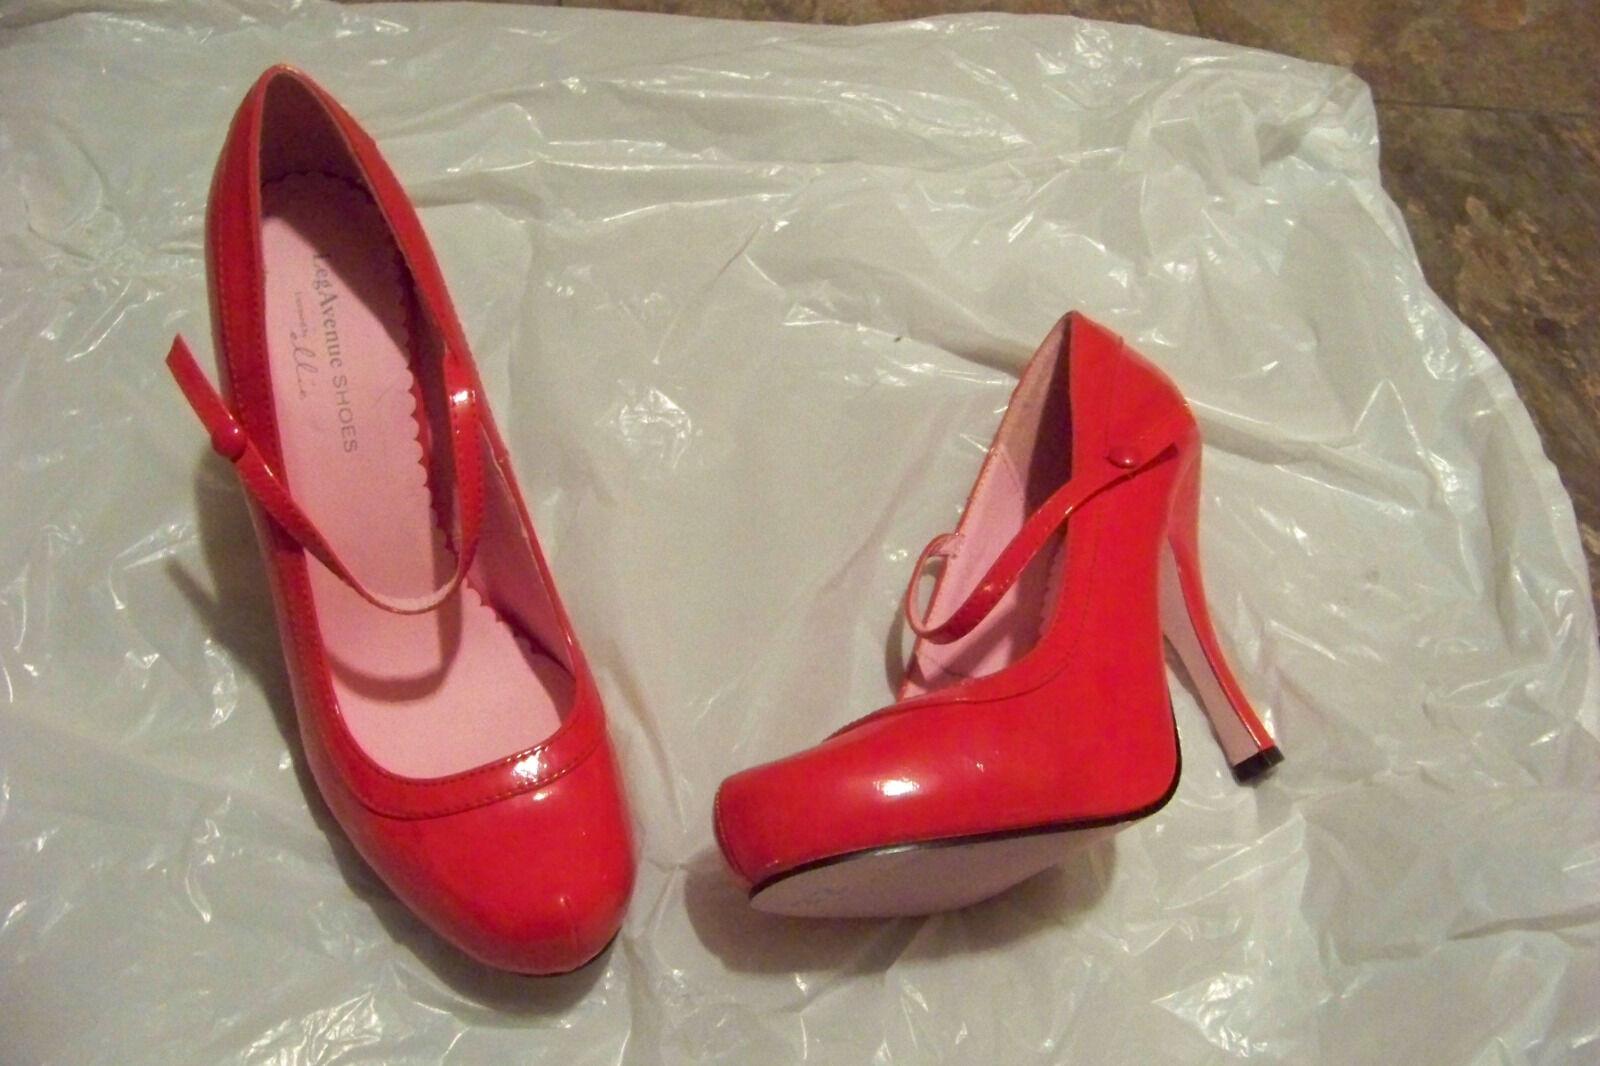 womens 9 leg avenue red mary jane heels shoes size 9 womens runs sm 8 1/2 6ba47b